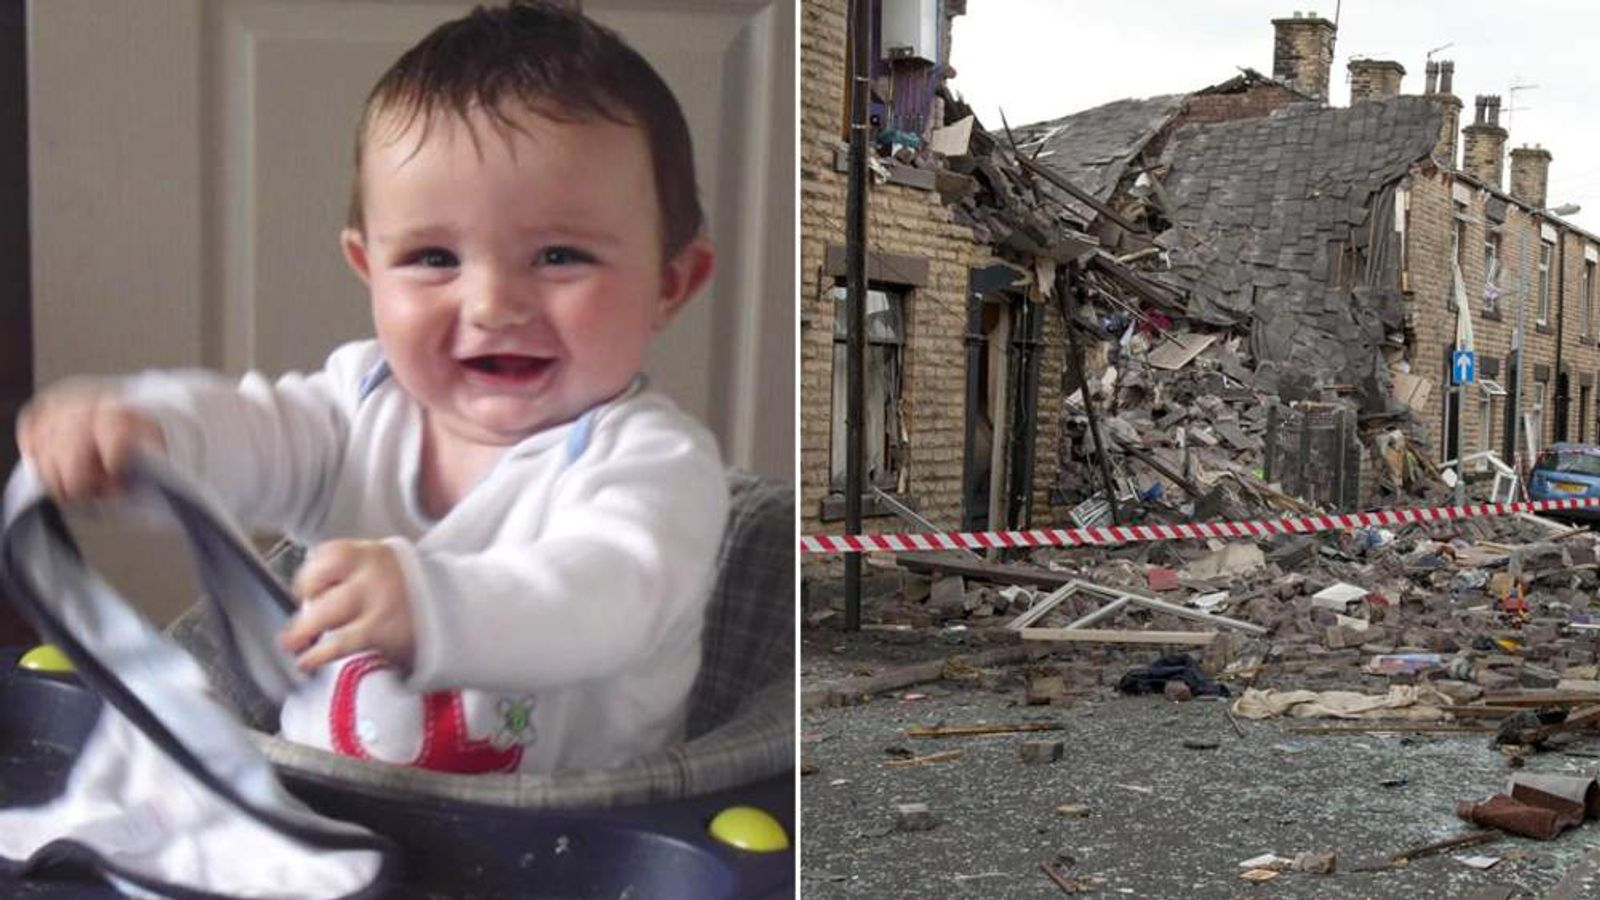 Explosion in Oldham